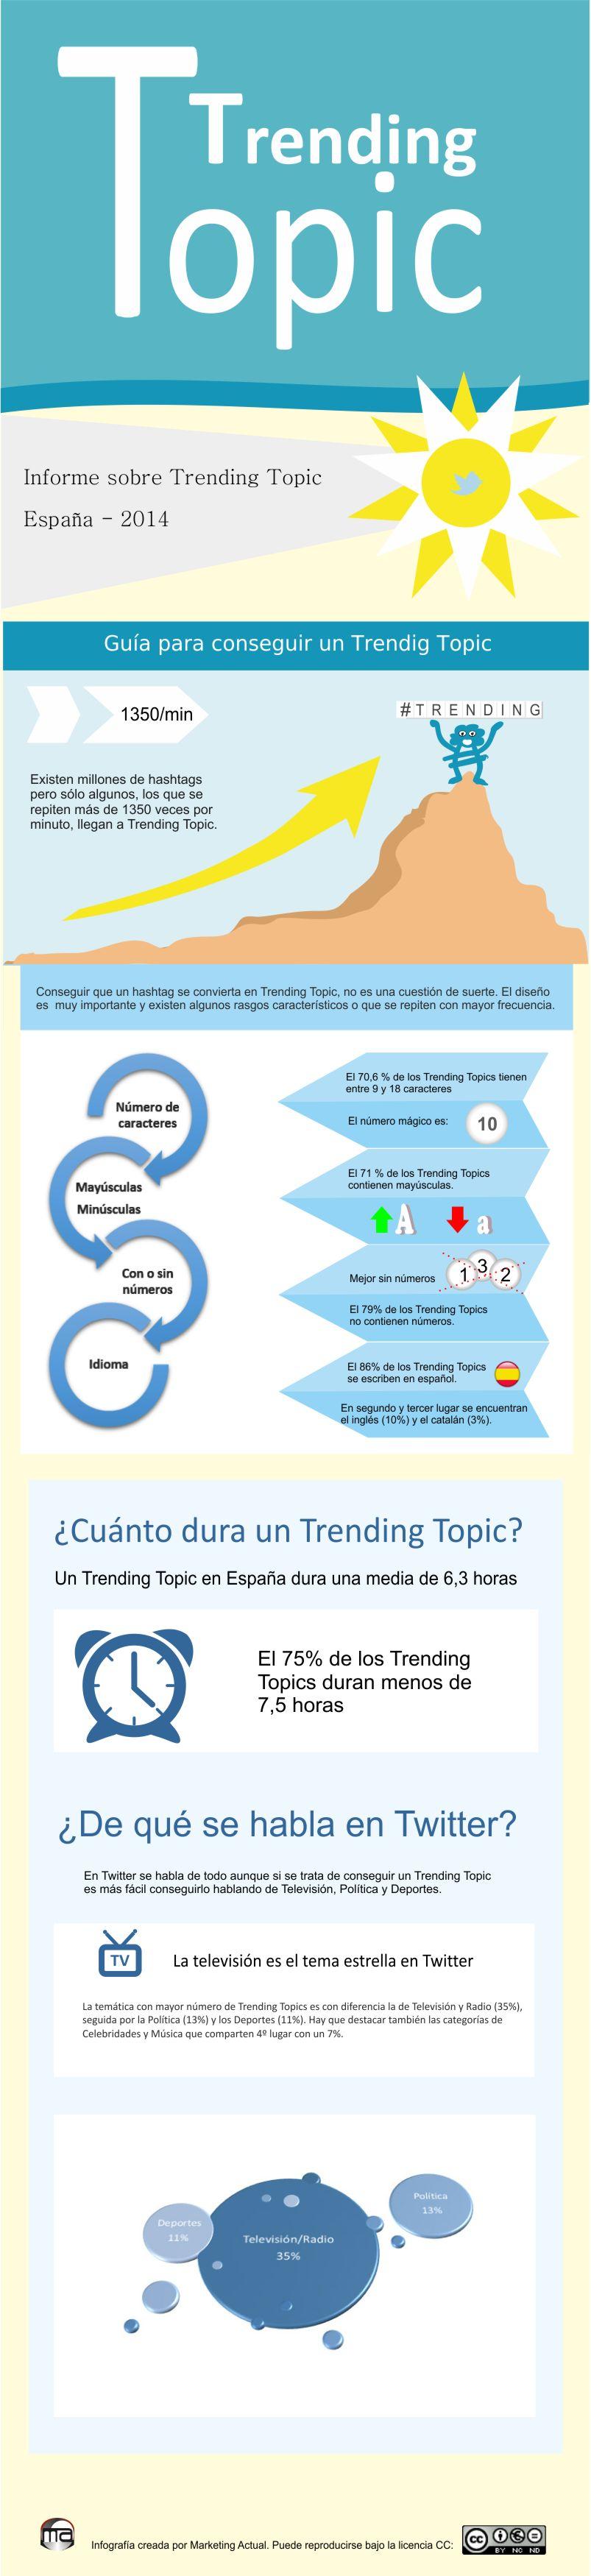 Informe Trending Topic, España, 2014